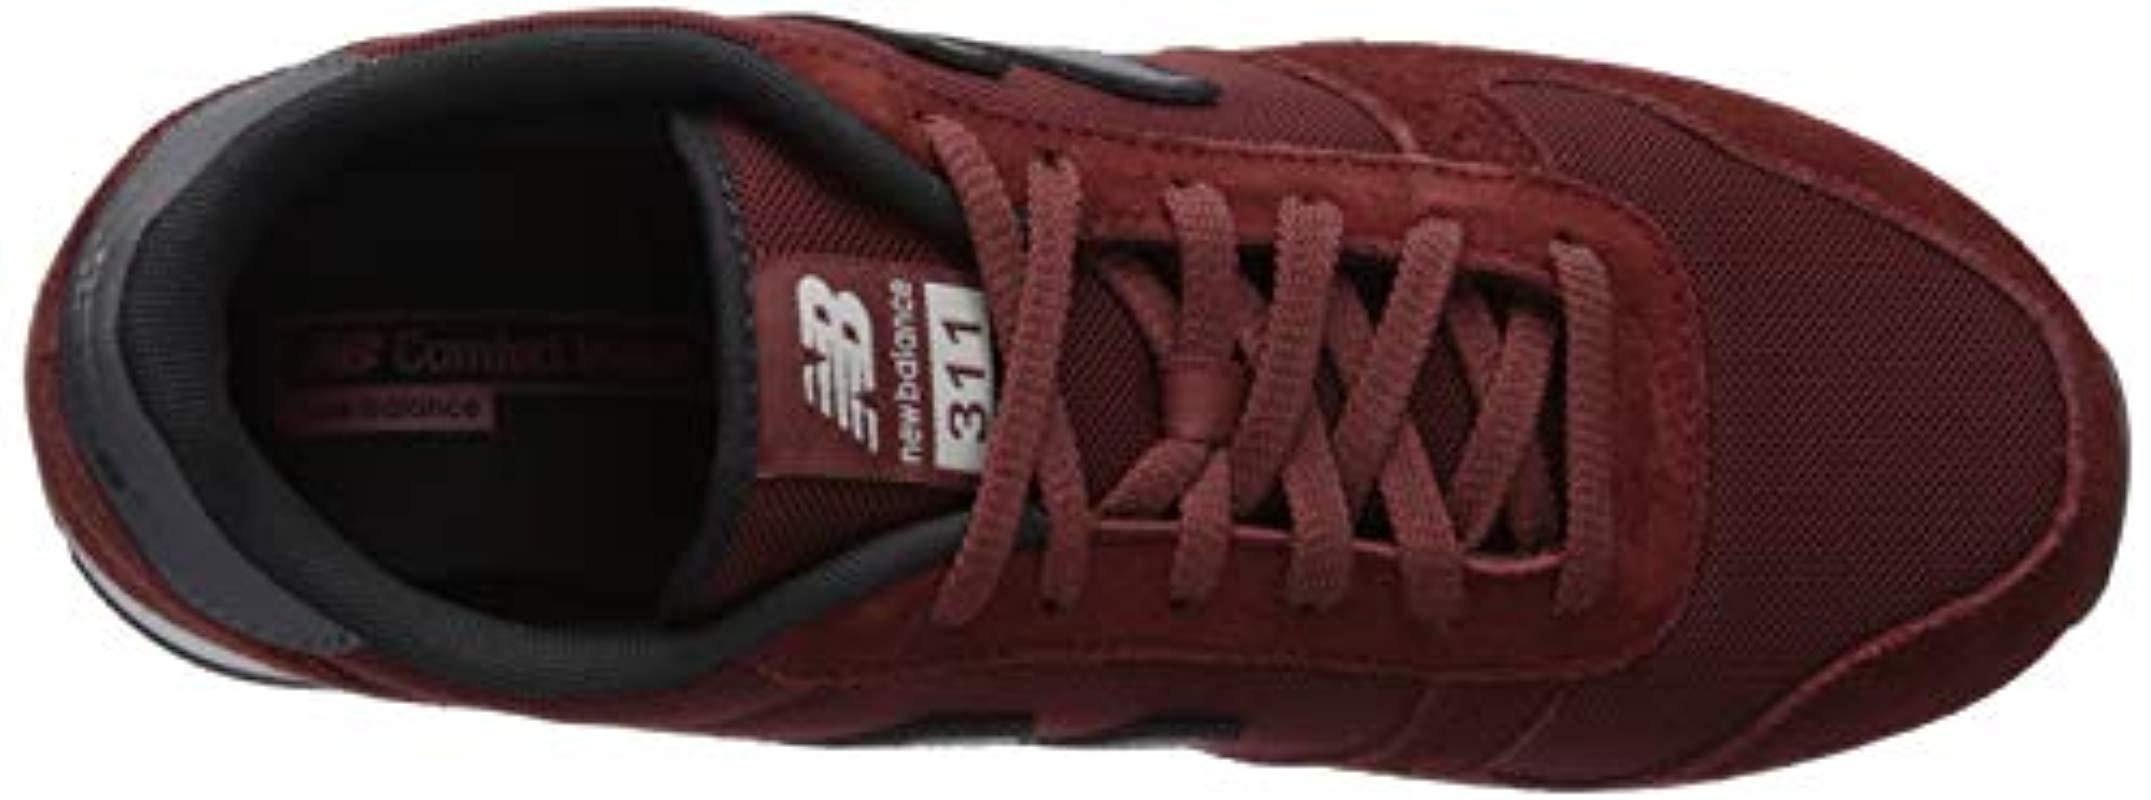 311v1 Lifestyle Shoe Sneaker